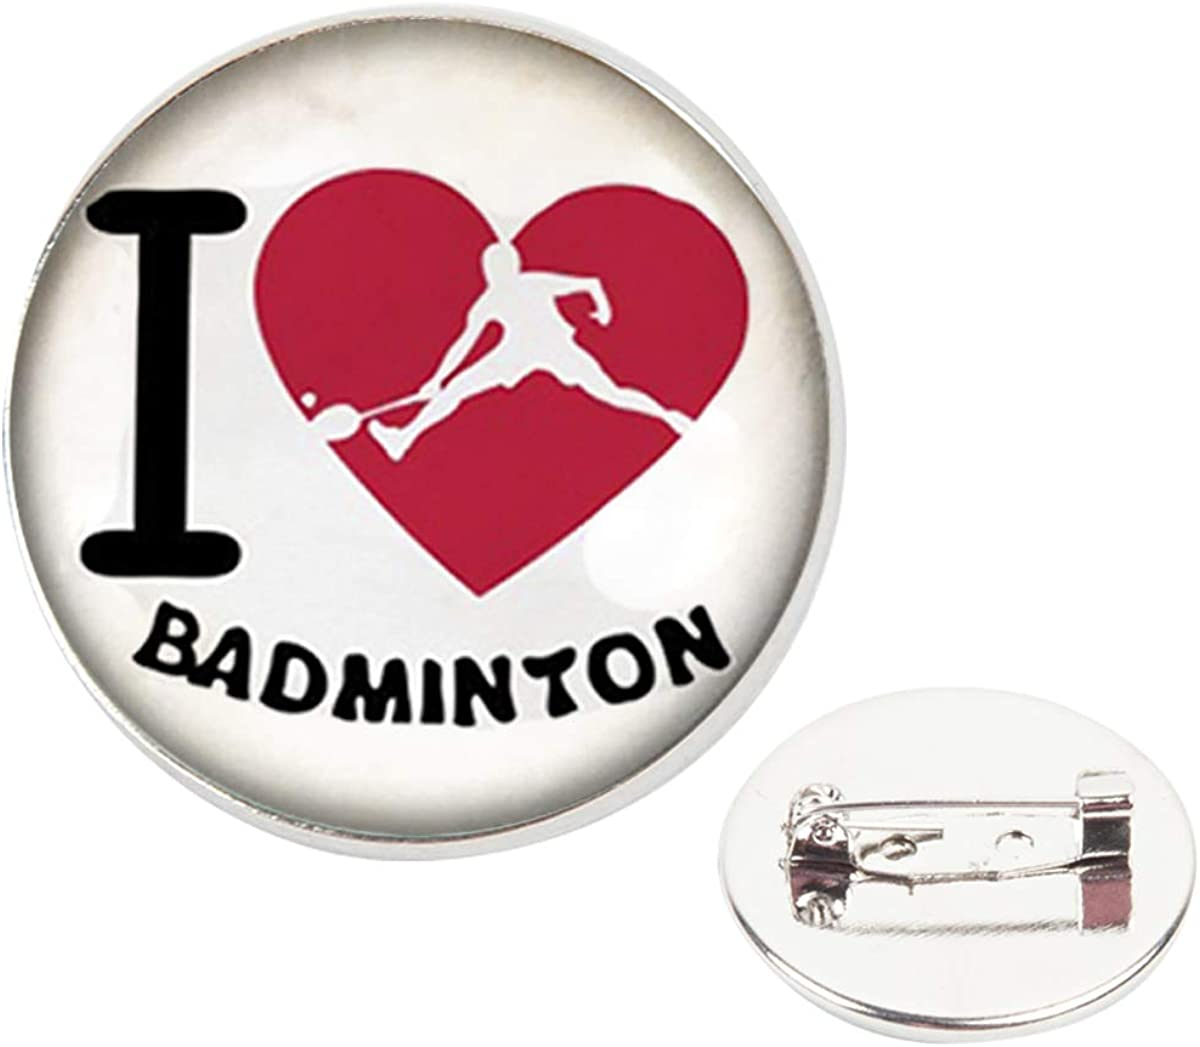 Pinback Buttons Badges Pins I Love Badmintons Lapel Pin Brooch Clip Trendy Accessory Jacket T-Shirt Bag Hat Shoe